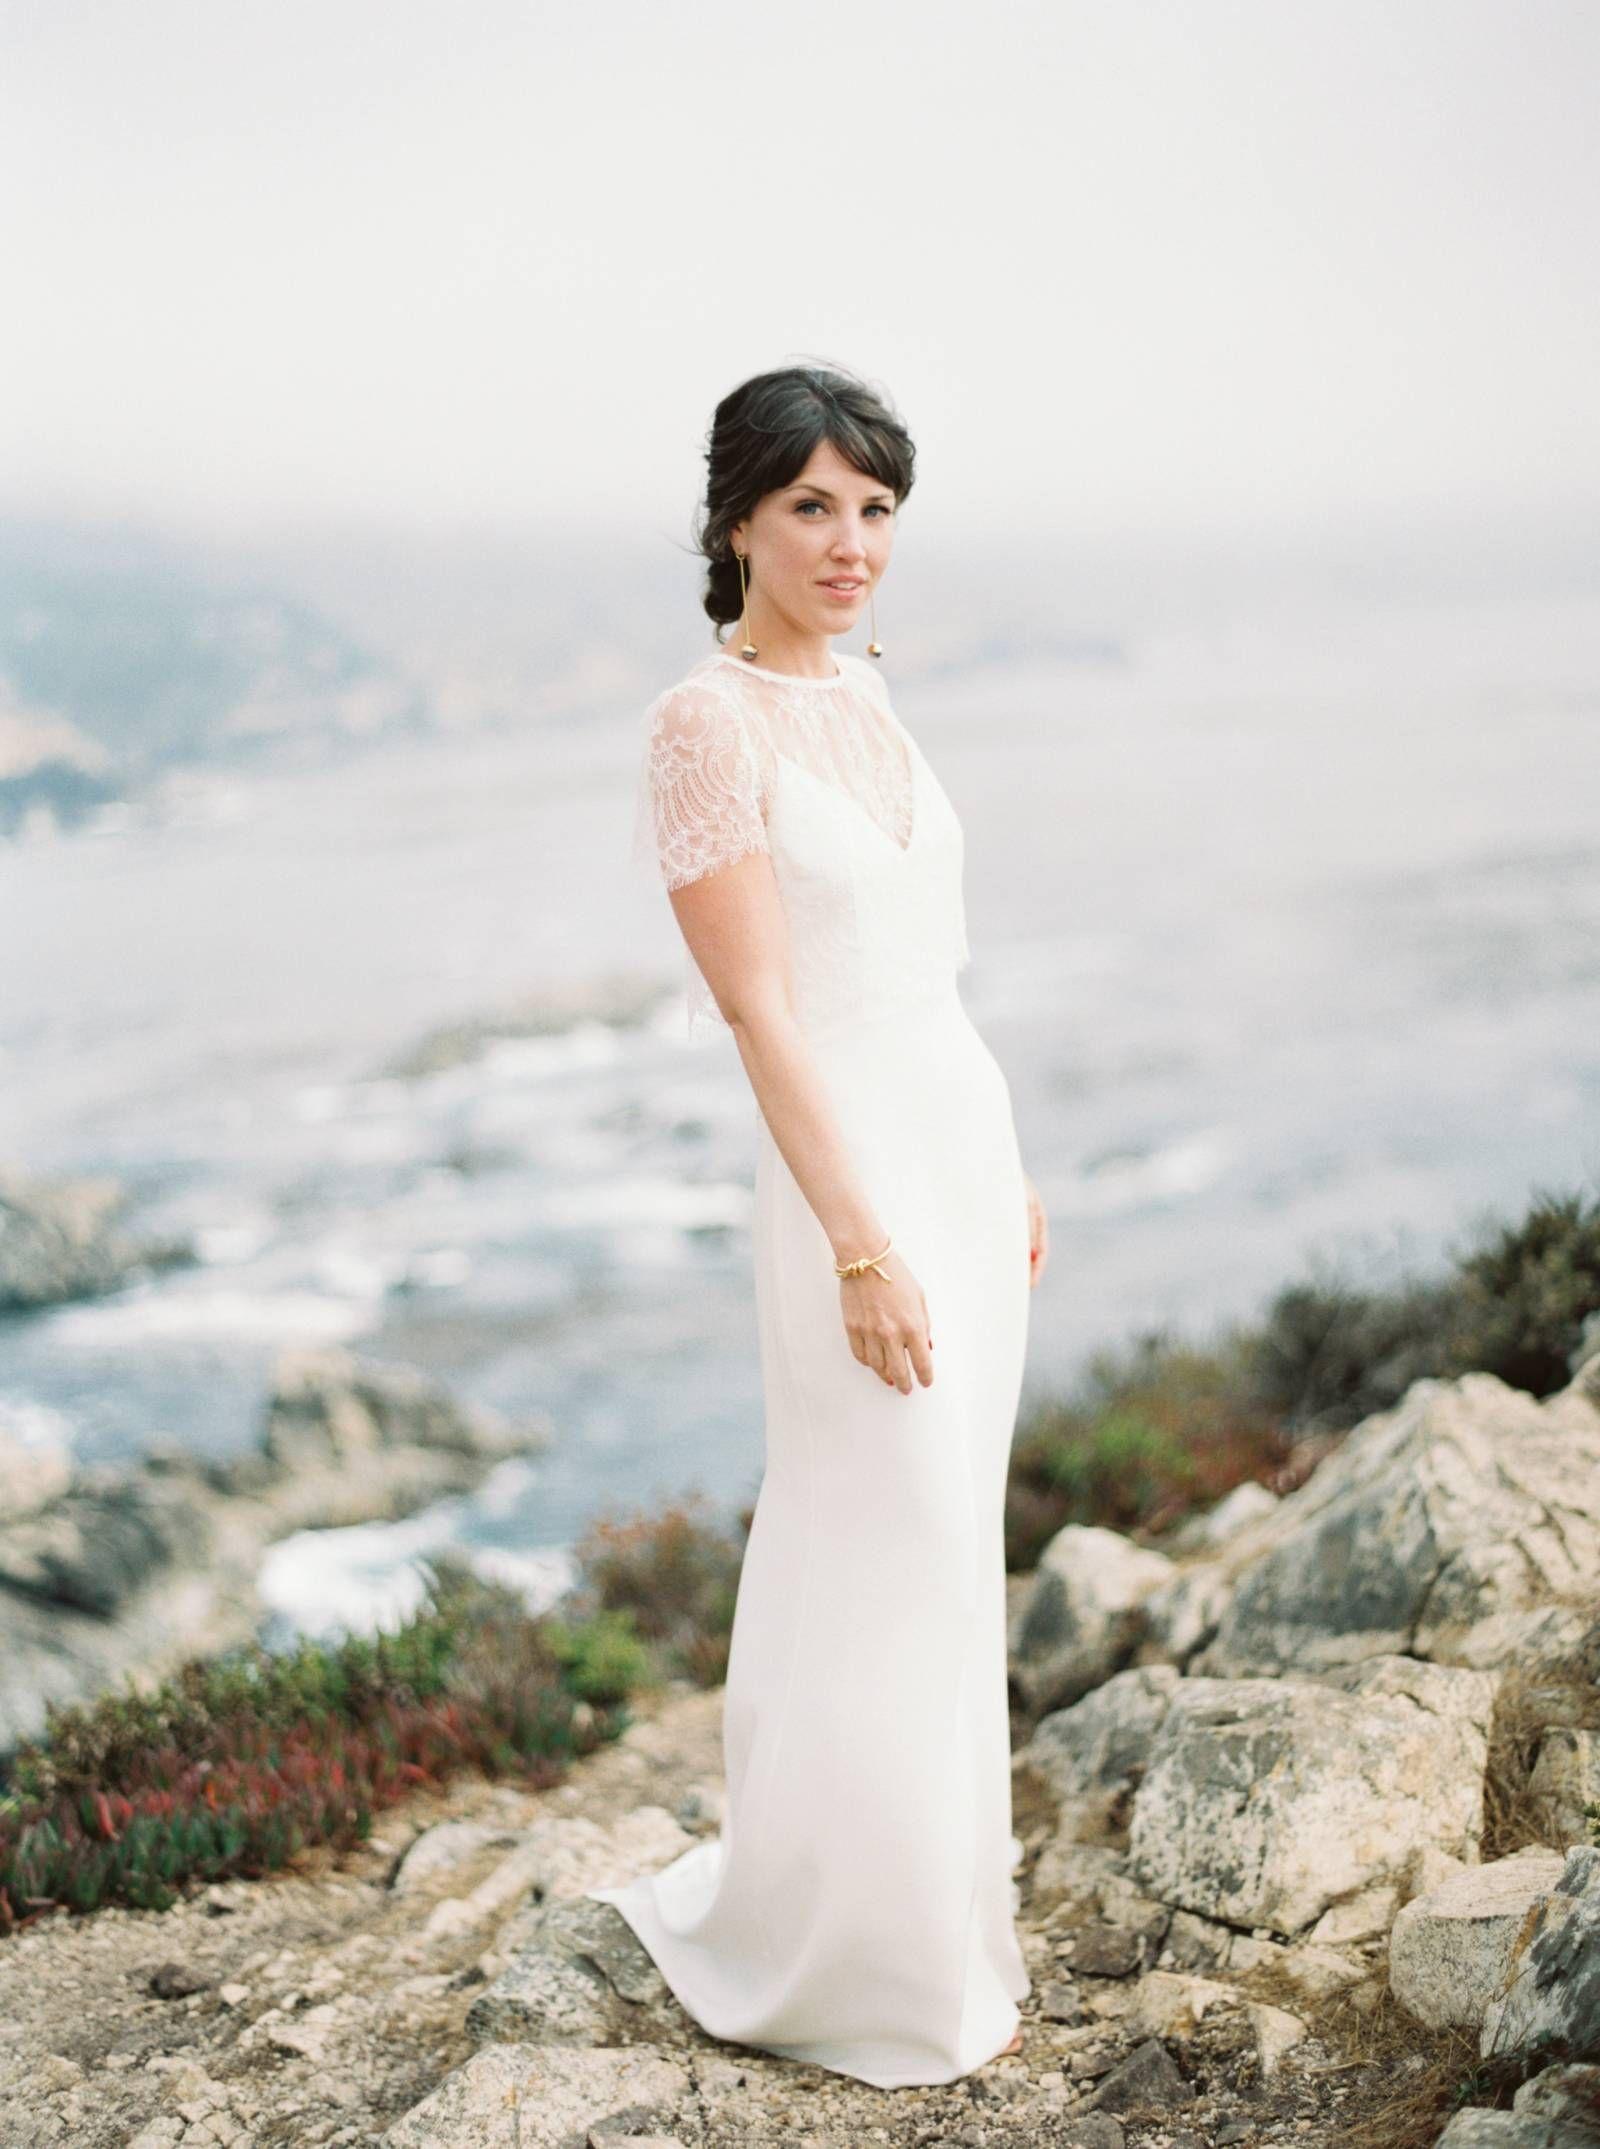 Breathtaking Bespoke Pacific Coast Wedding Via Weddings: Tropical Island Beach Wedding Dresses At Reisefeber.org